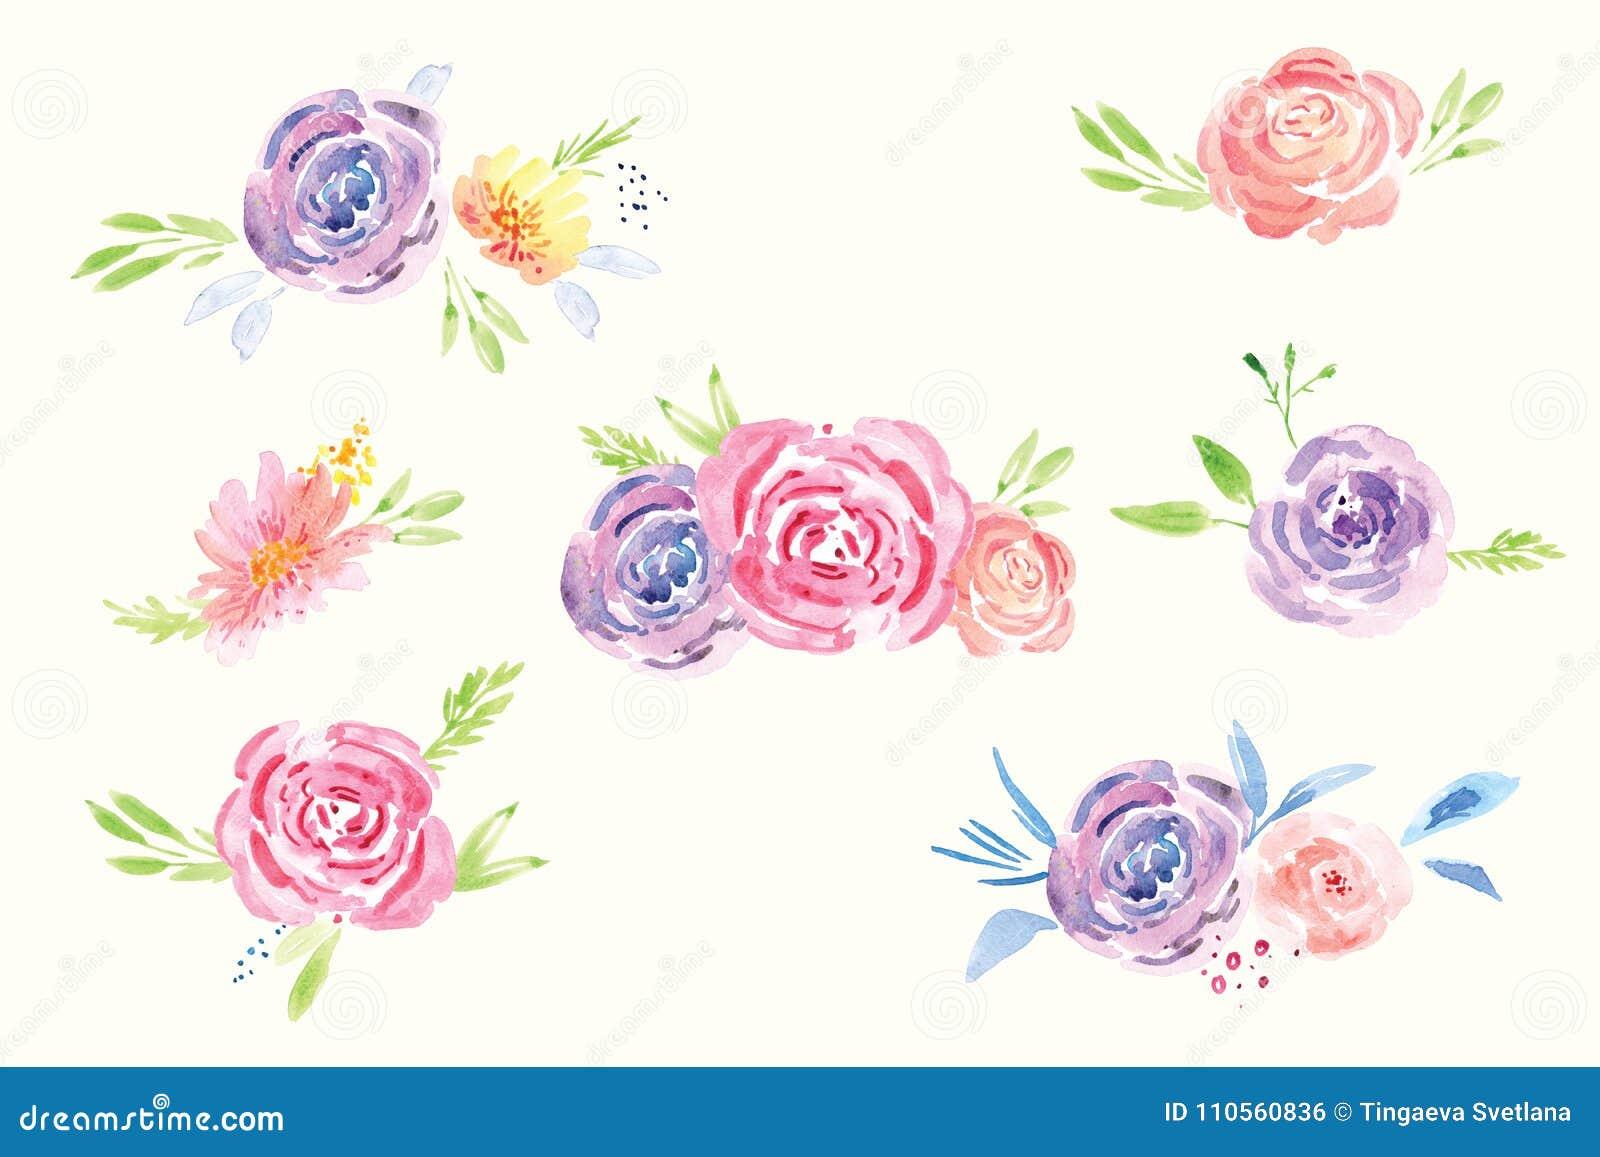 Frühlings Blumen Aquarell Clipart Stock Abbildung Illustration Von